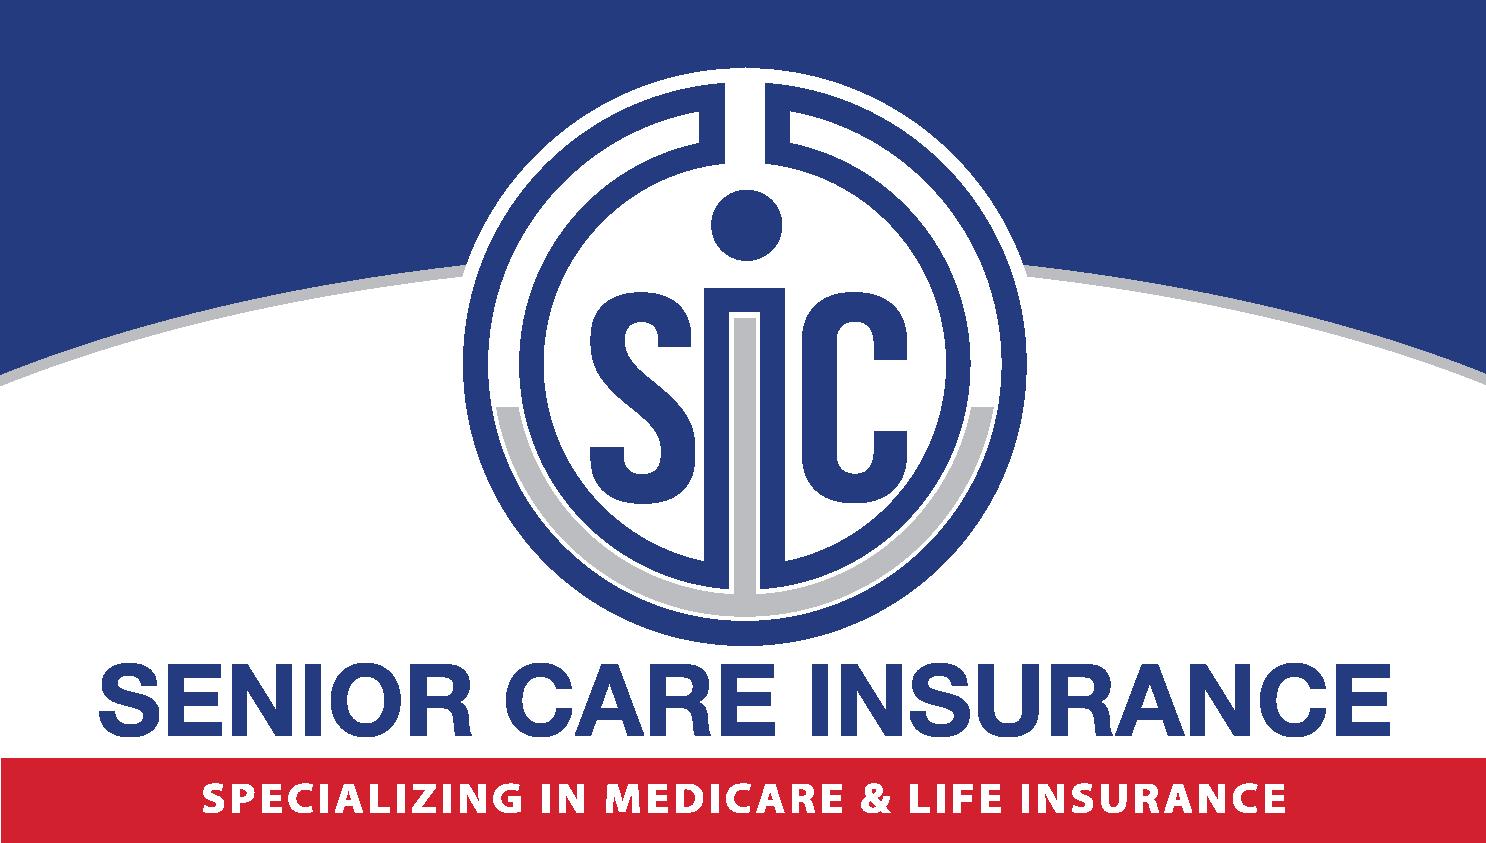 Senior Care Insurance - Ohio Medicare and Life Insurance